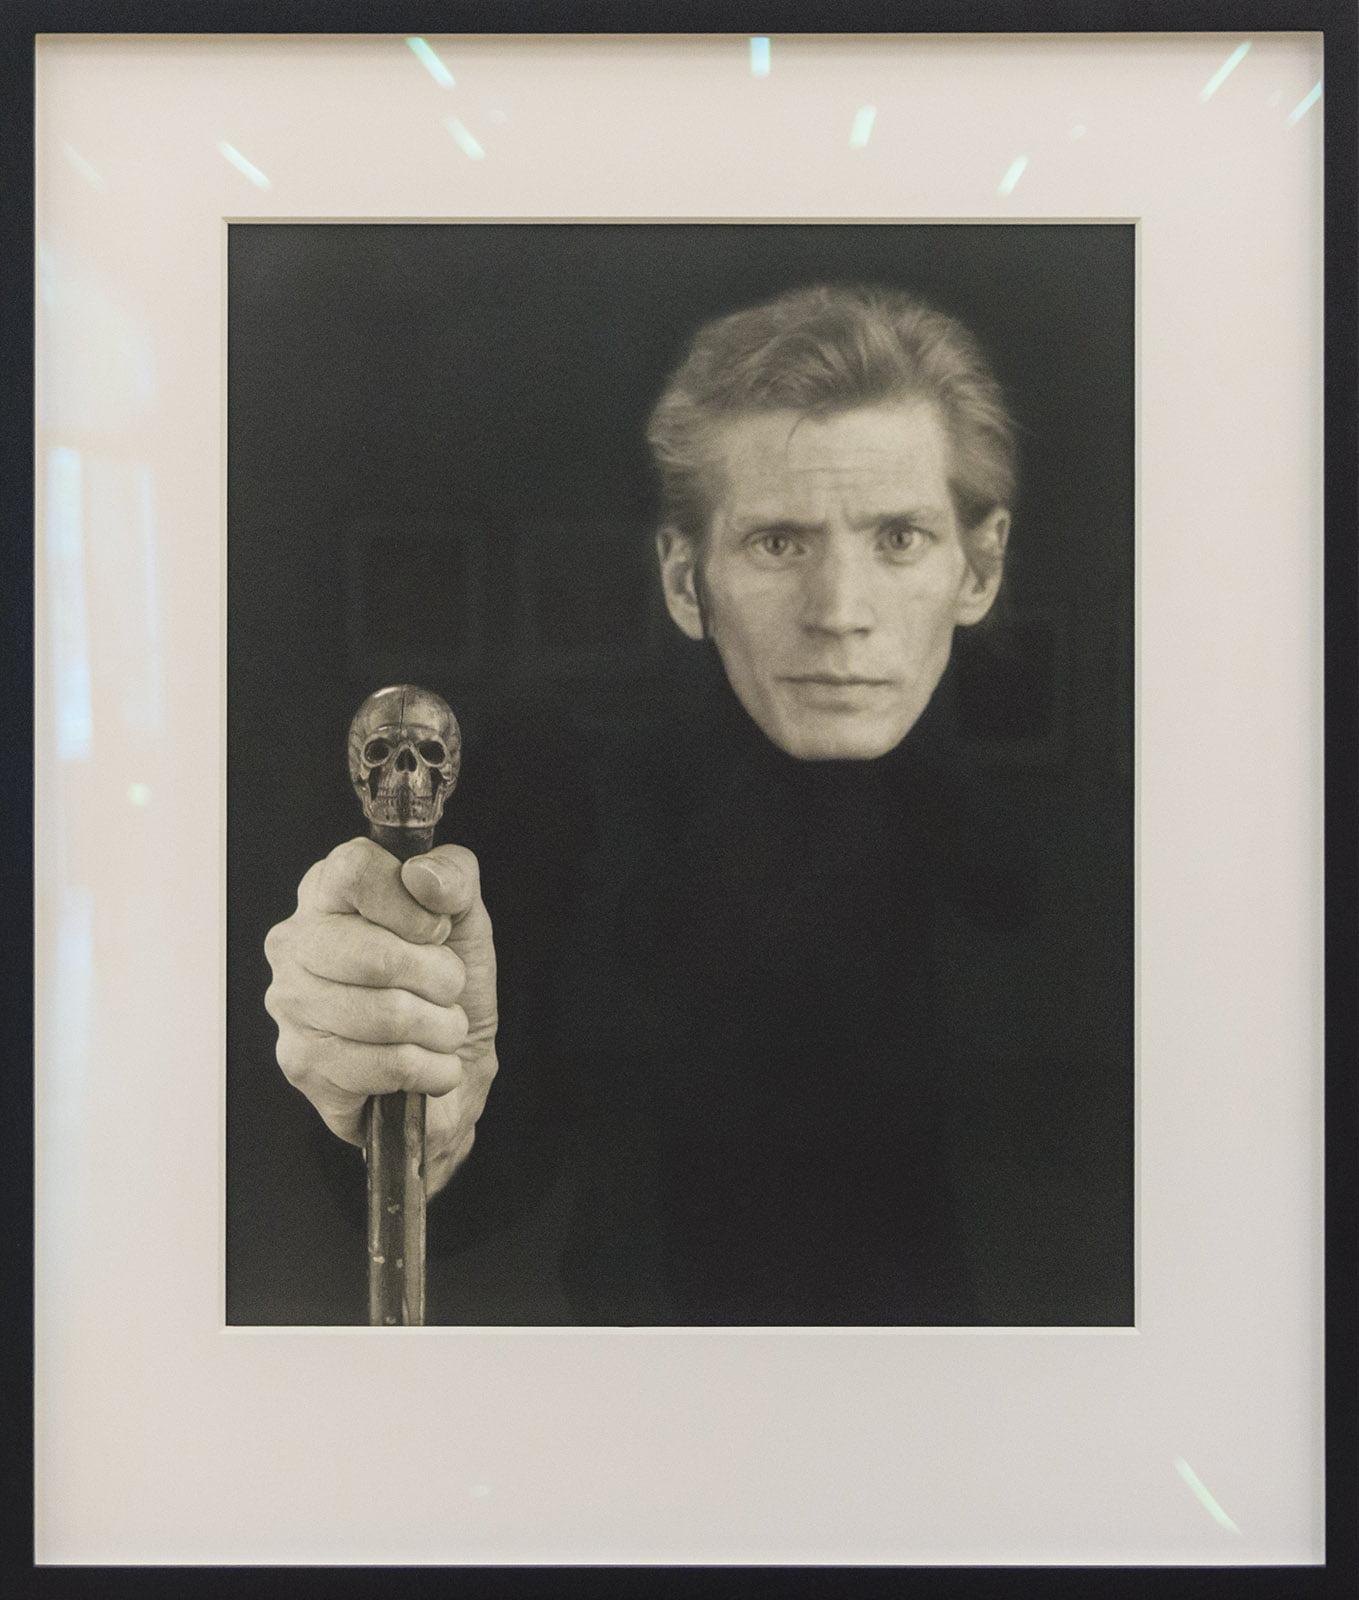 Kunsthal, Rotterdam, Robert Mapplethorpe, selfportrait